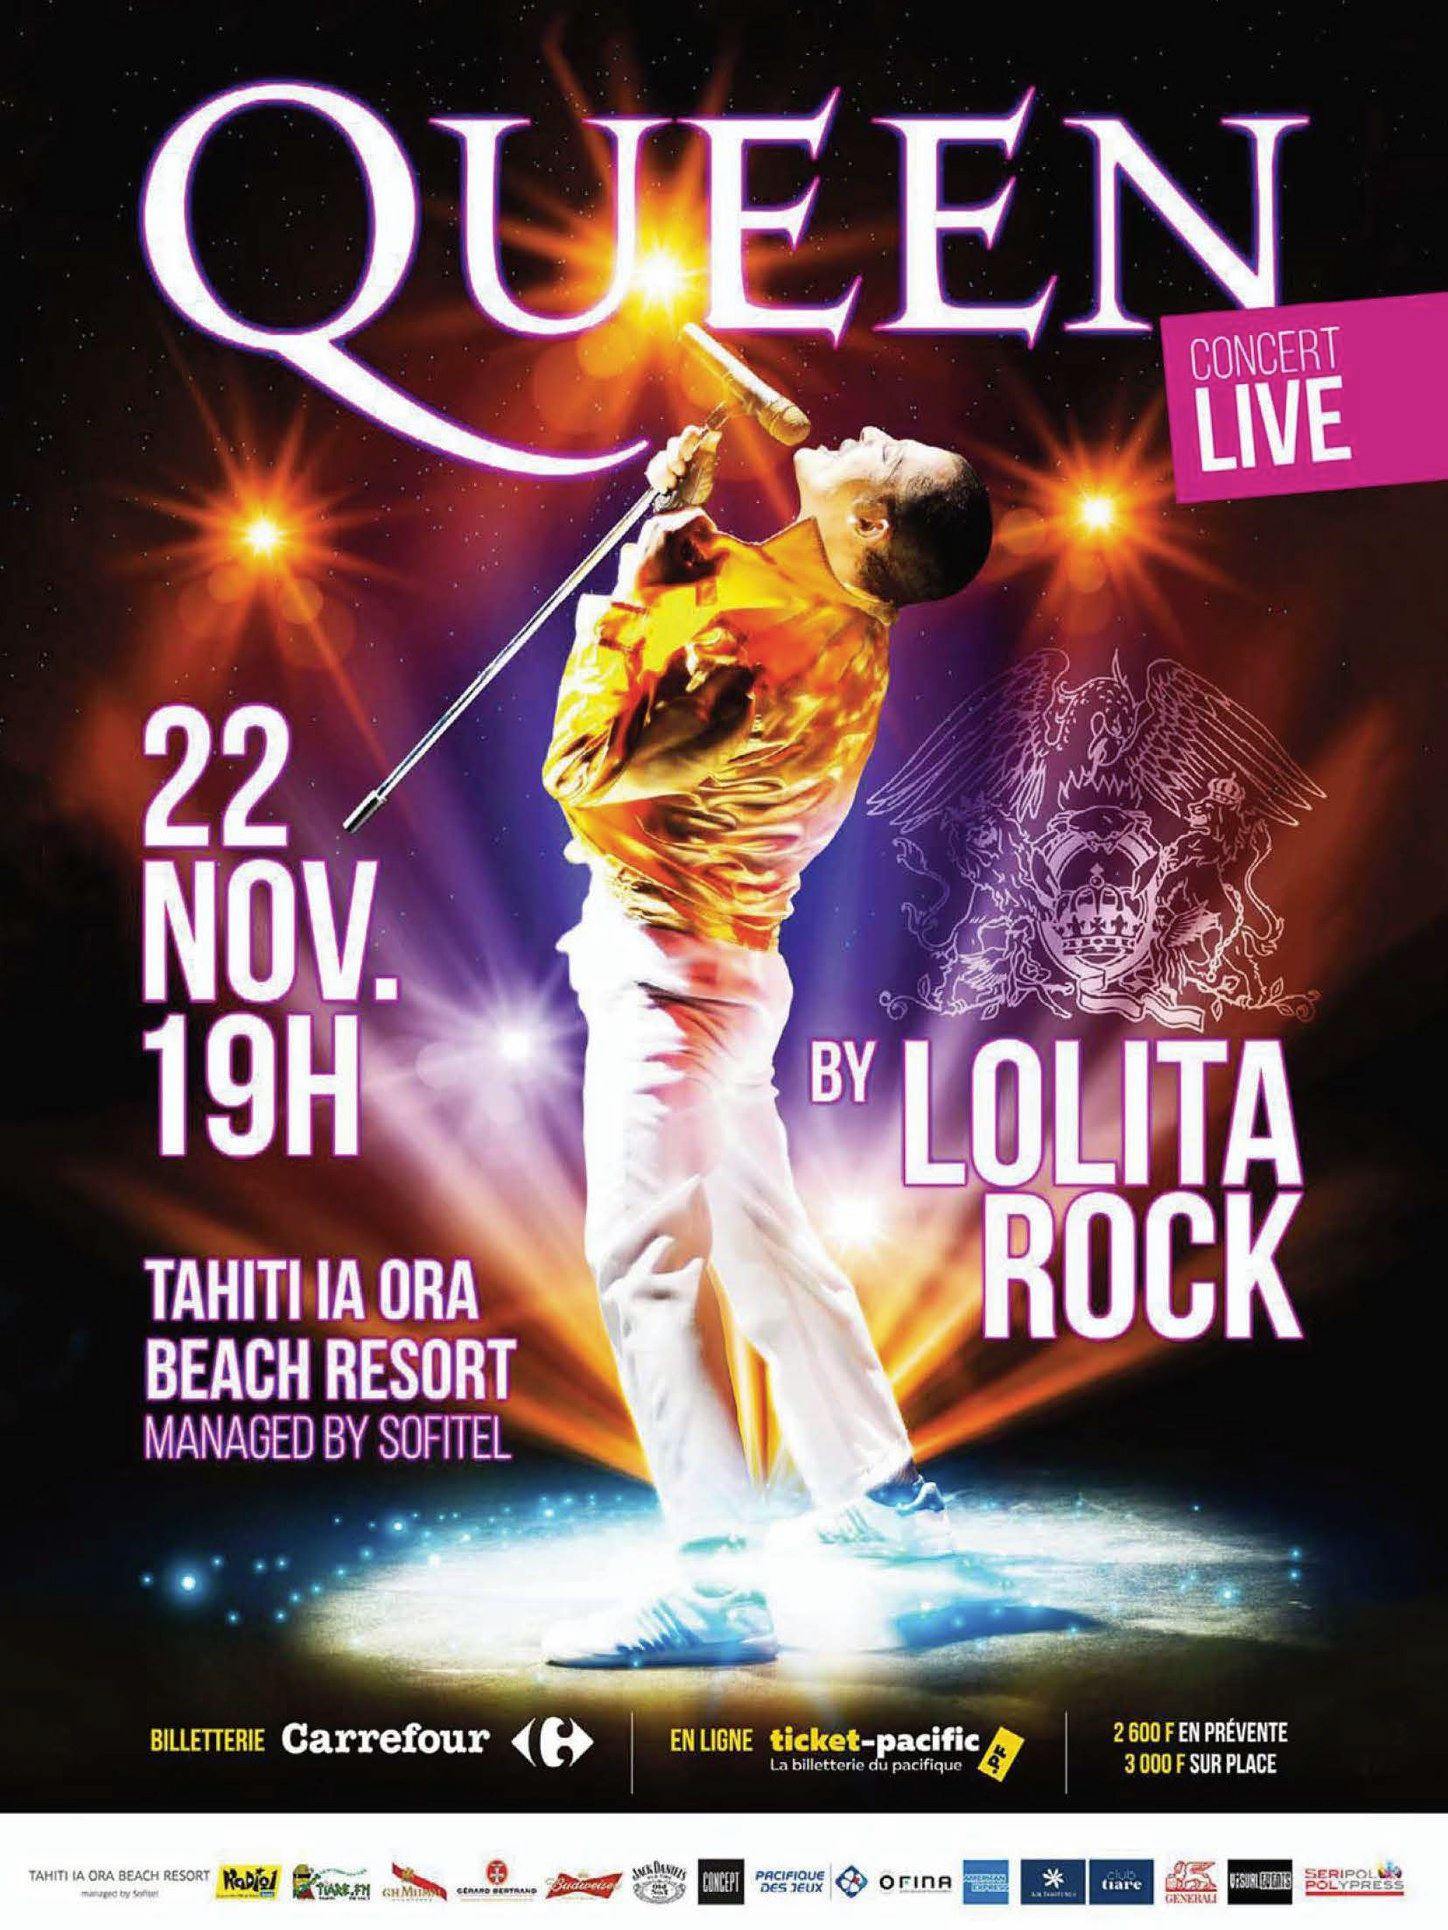 The show will go on avec Lolita Rock